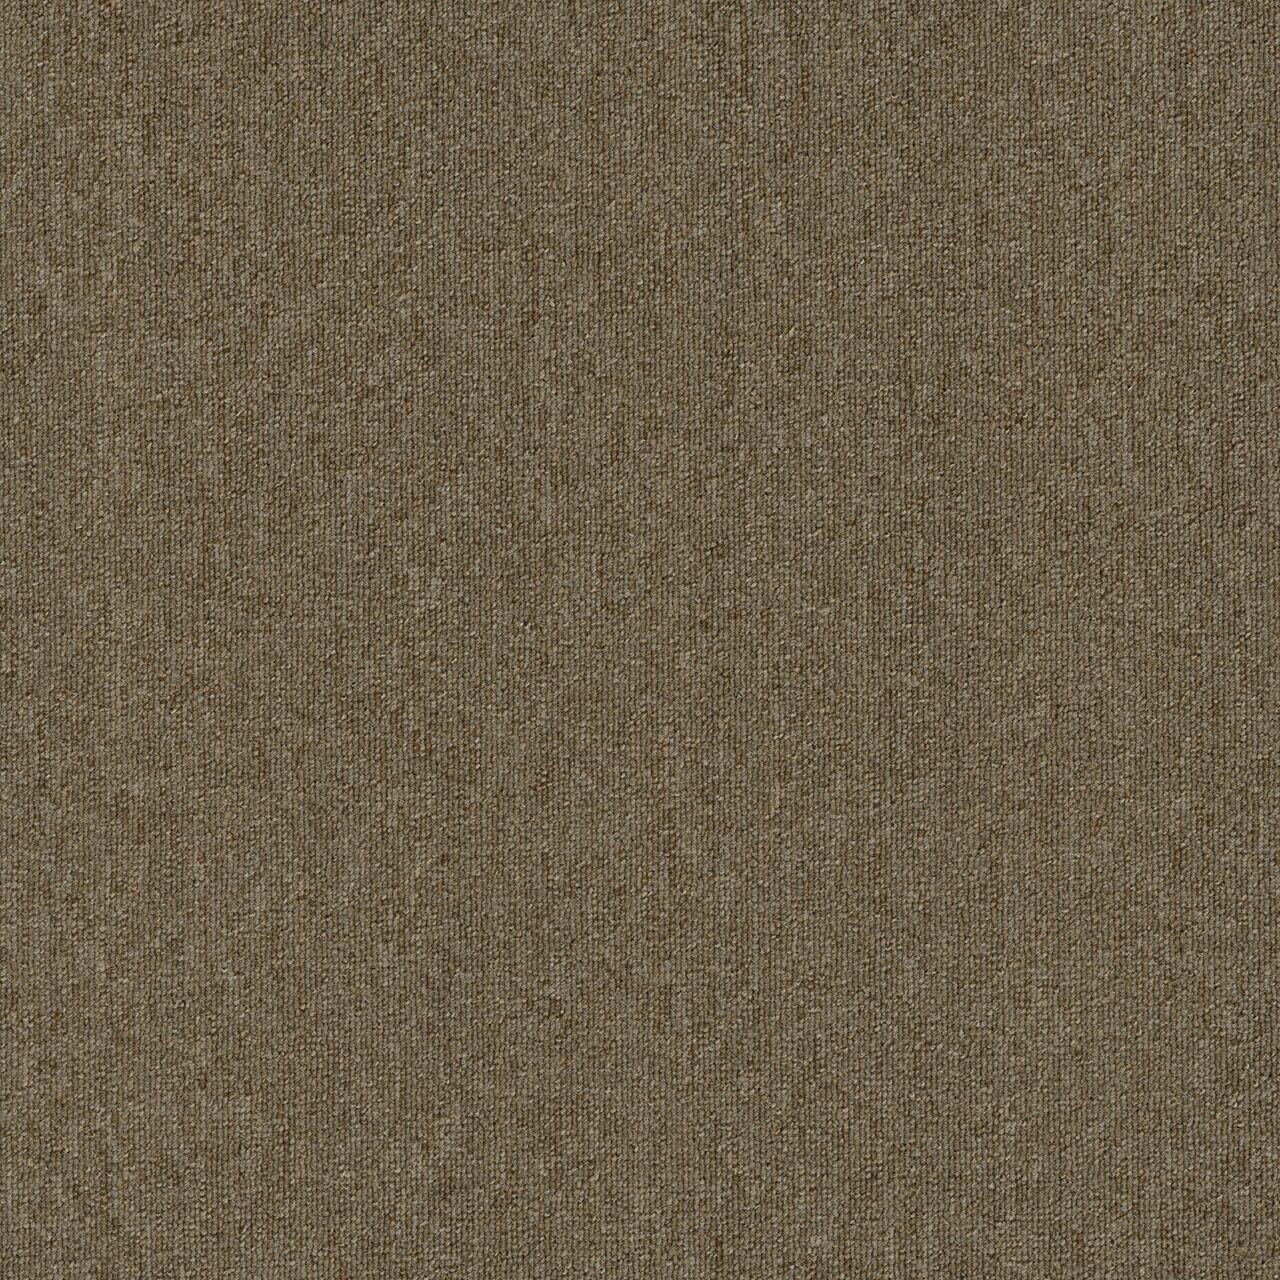 Praline In 2020 Commercial Carpet Carpet Styles Carpet